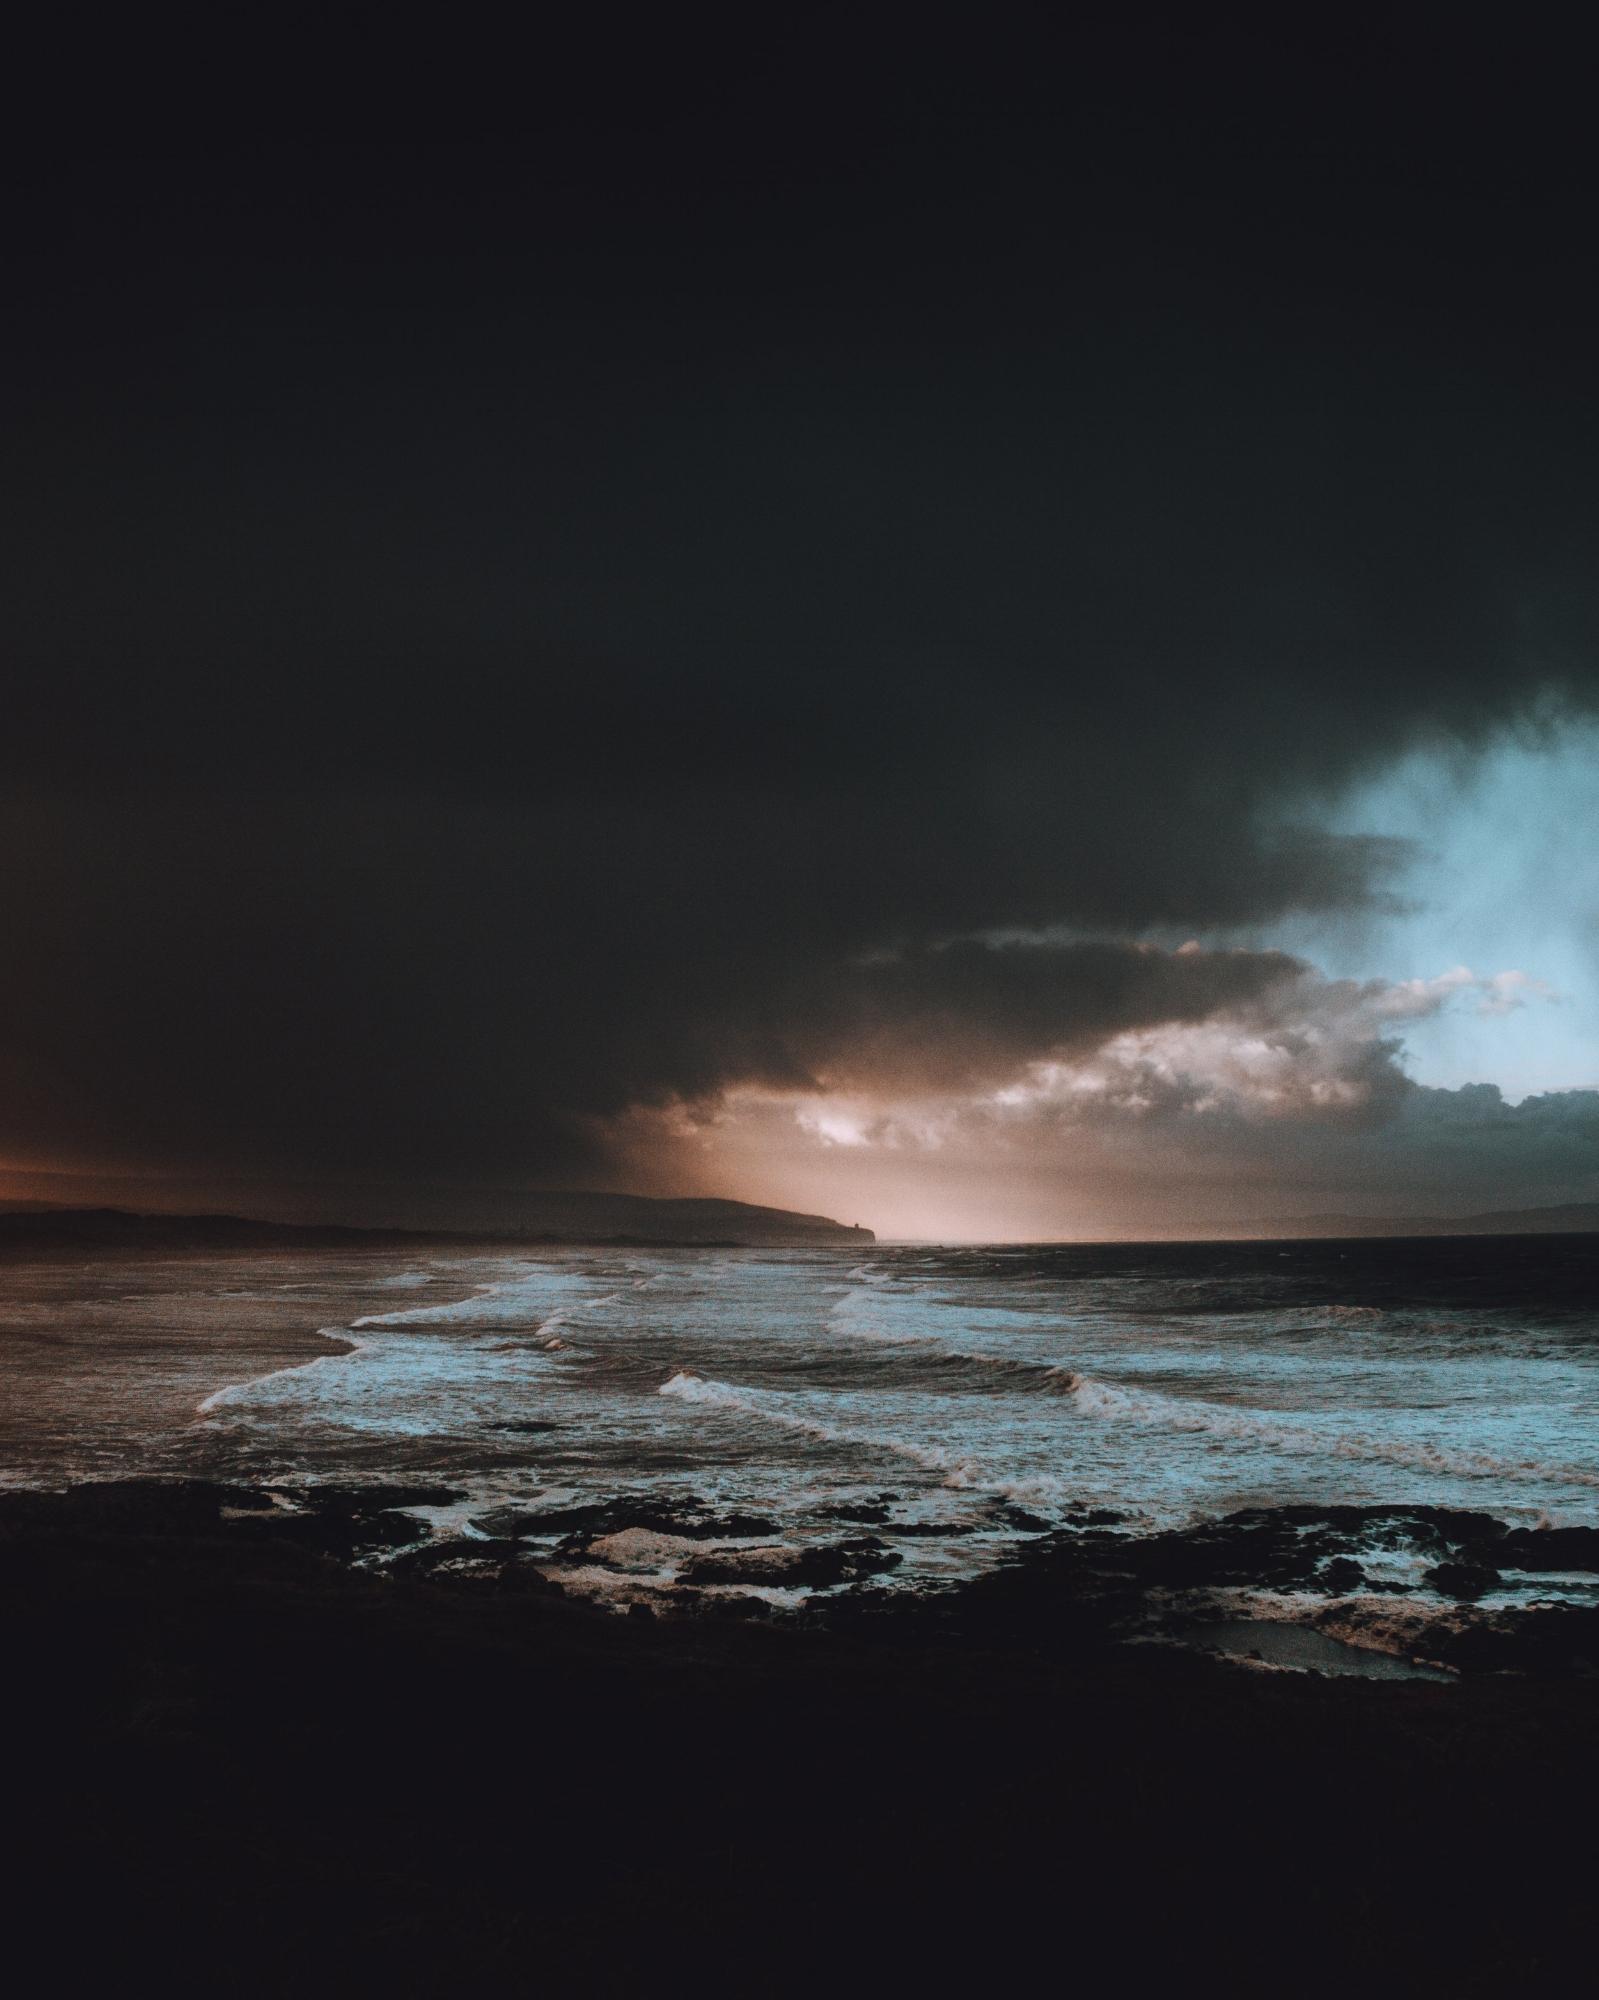 a cloudy landscape symbolizing depression